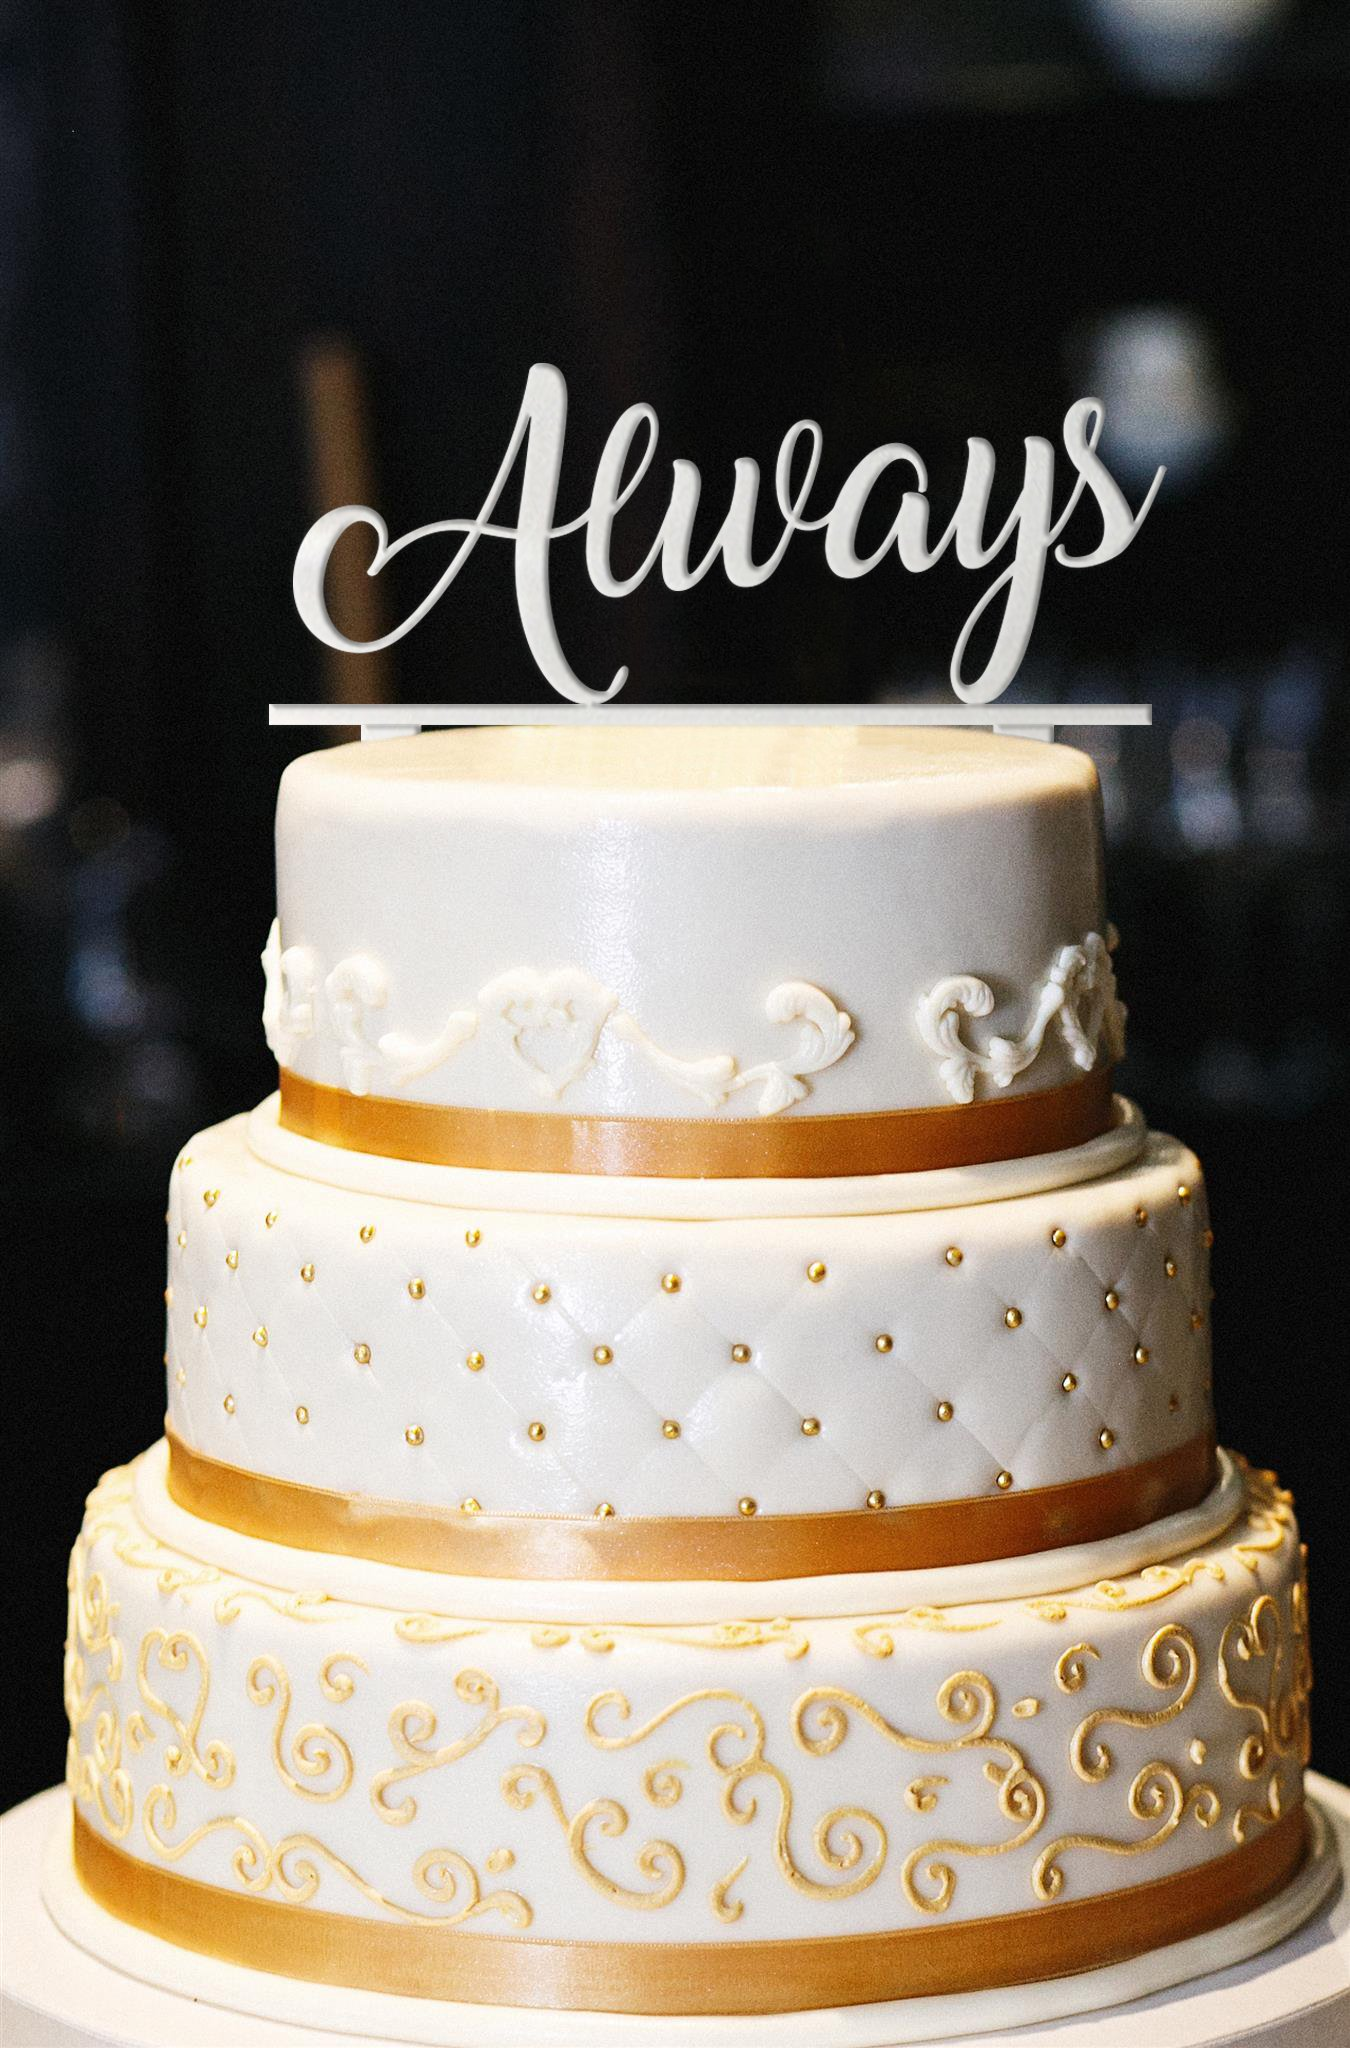 Always Wedding Cake Topper, Glitter Wedding Cake Topper, Engagement Cake Topper, Gold Cake Topper, Gold Glitter Cake Topper, Anniversary (13'', Pearl White)